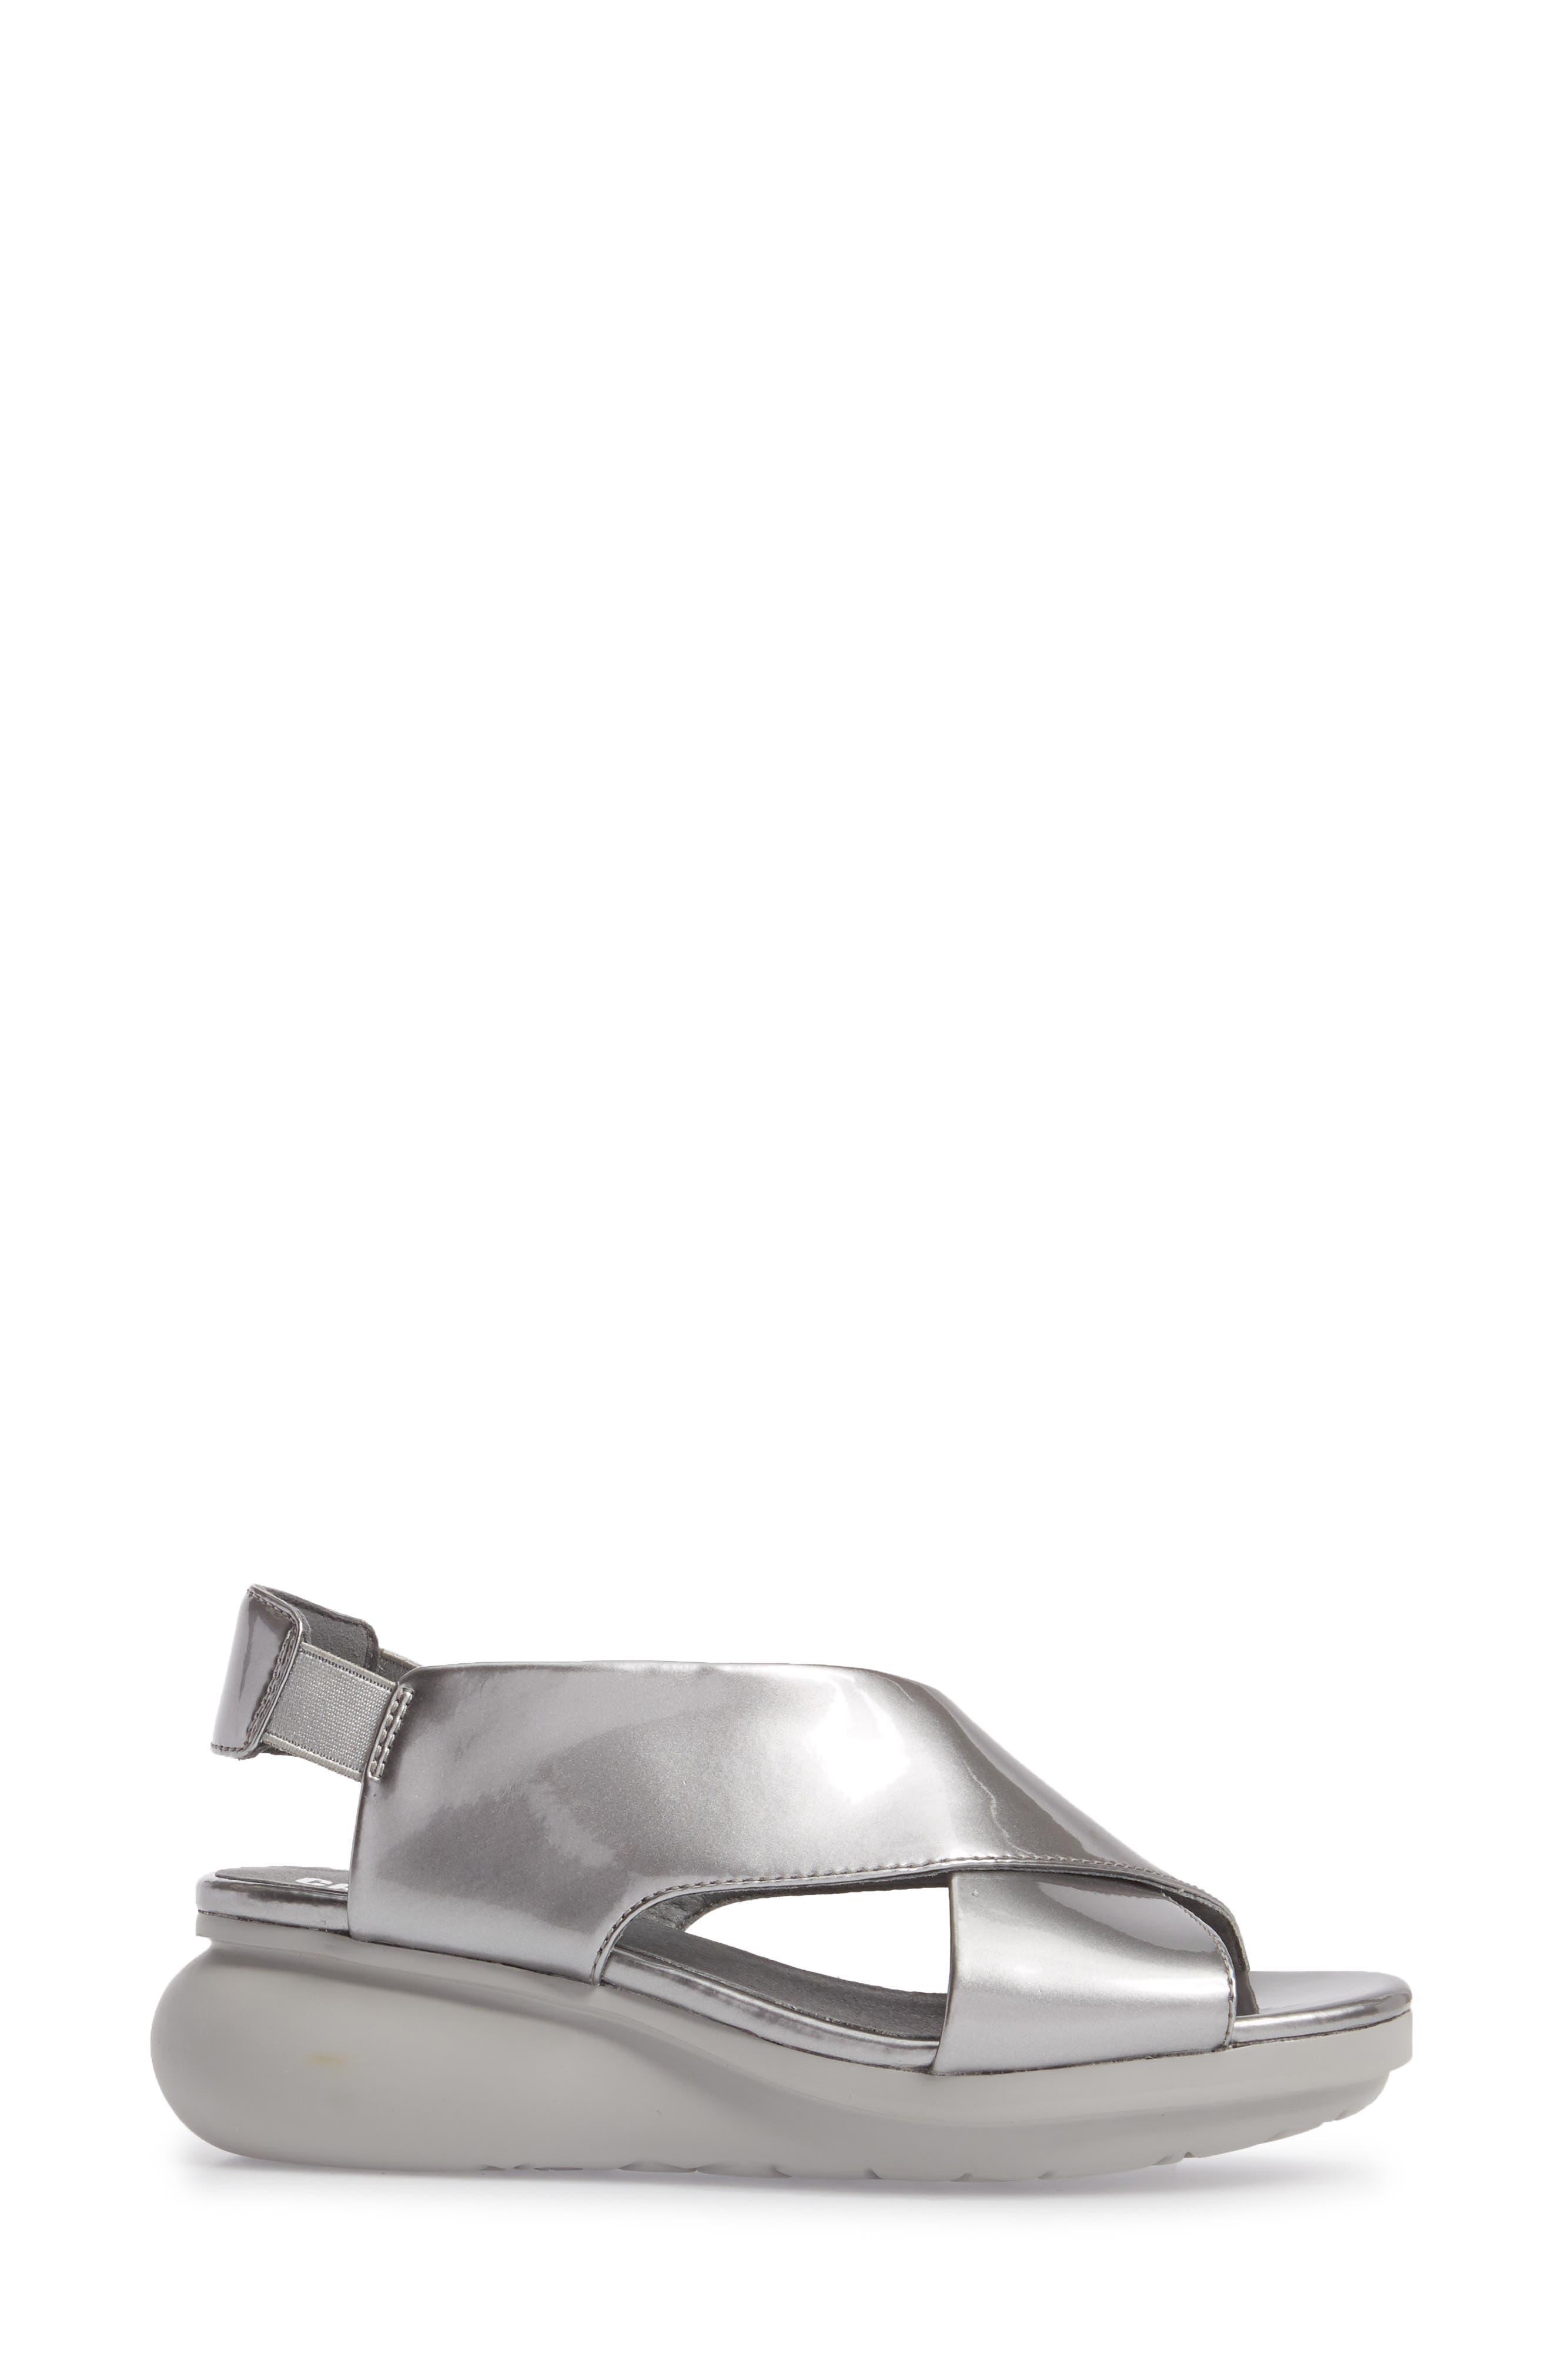 Balloon Wedge Sandal,                             Alternate thumbnail 3, color,                             Medium Gray Leather